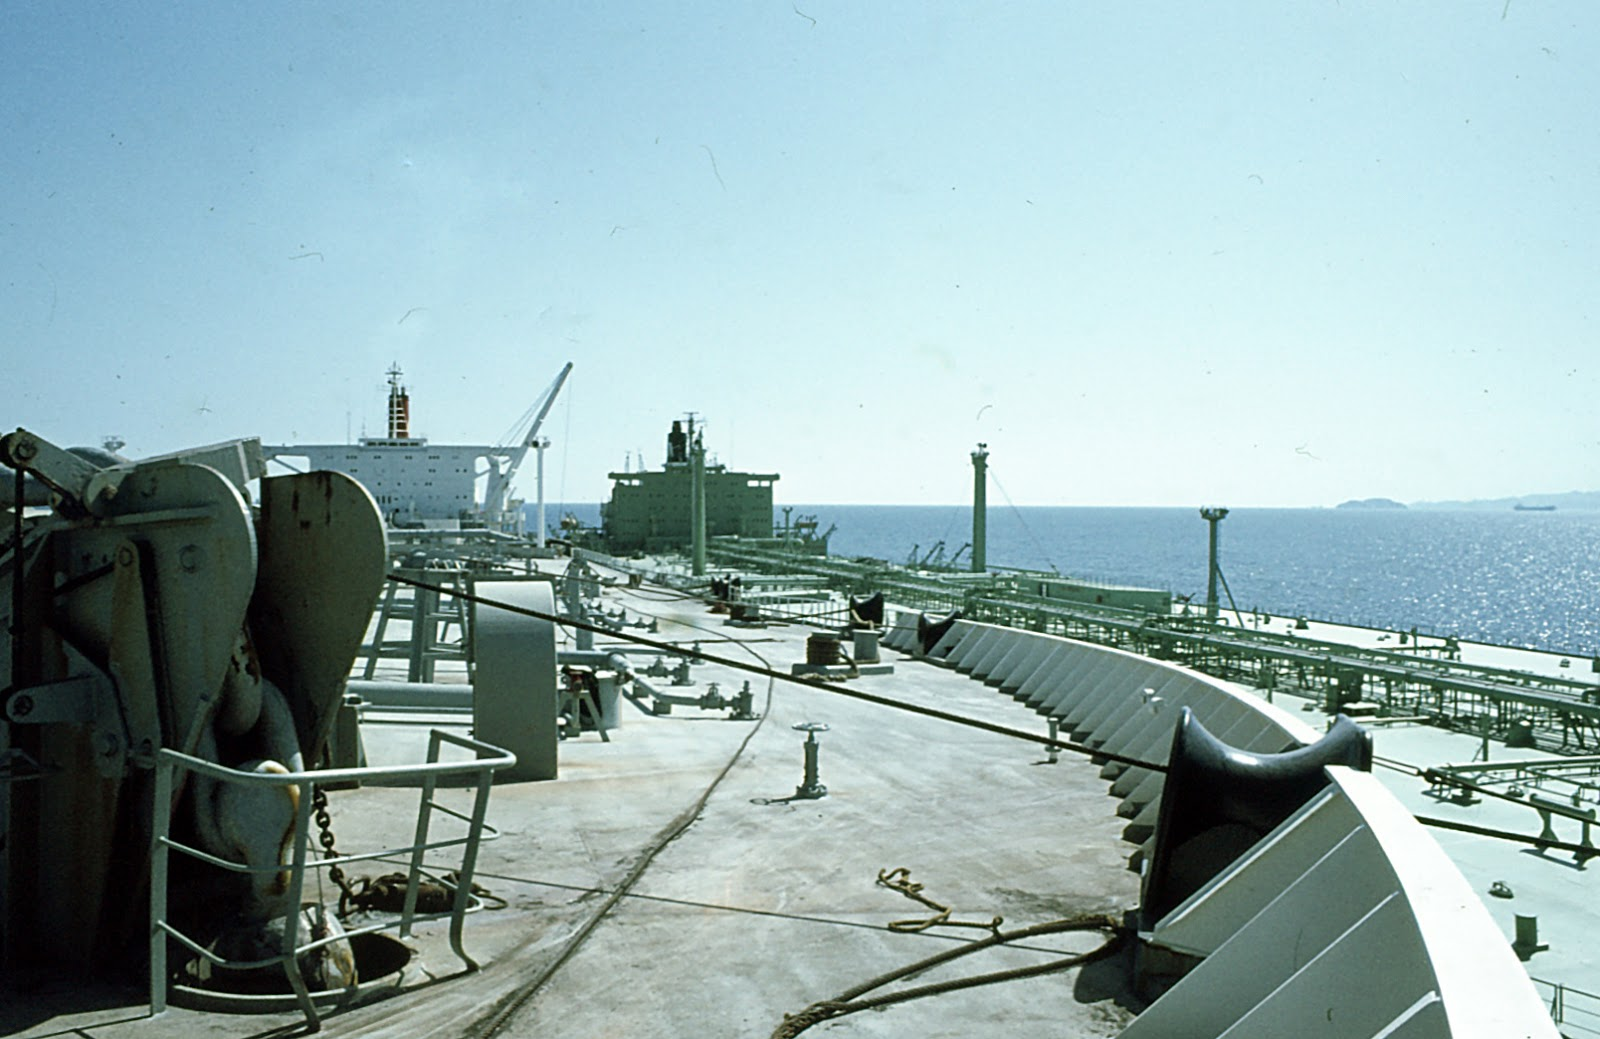 39 zien en weten 39 lepton s s shell tankers b v deel 1 3b for Helmers accommodatie en interieur bv